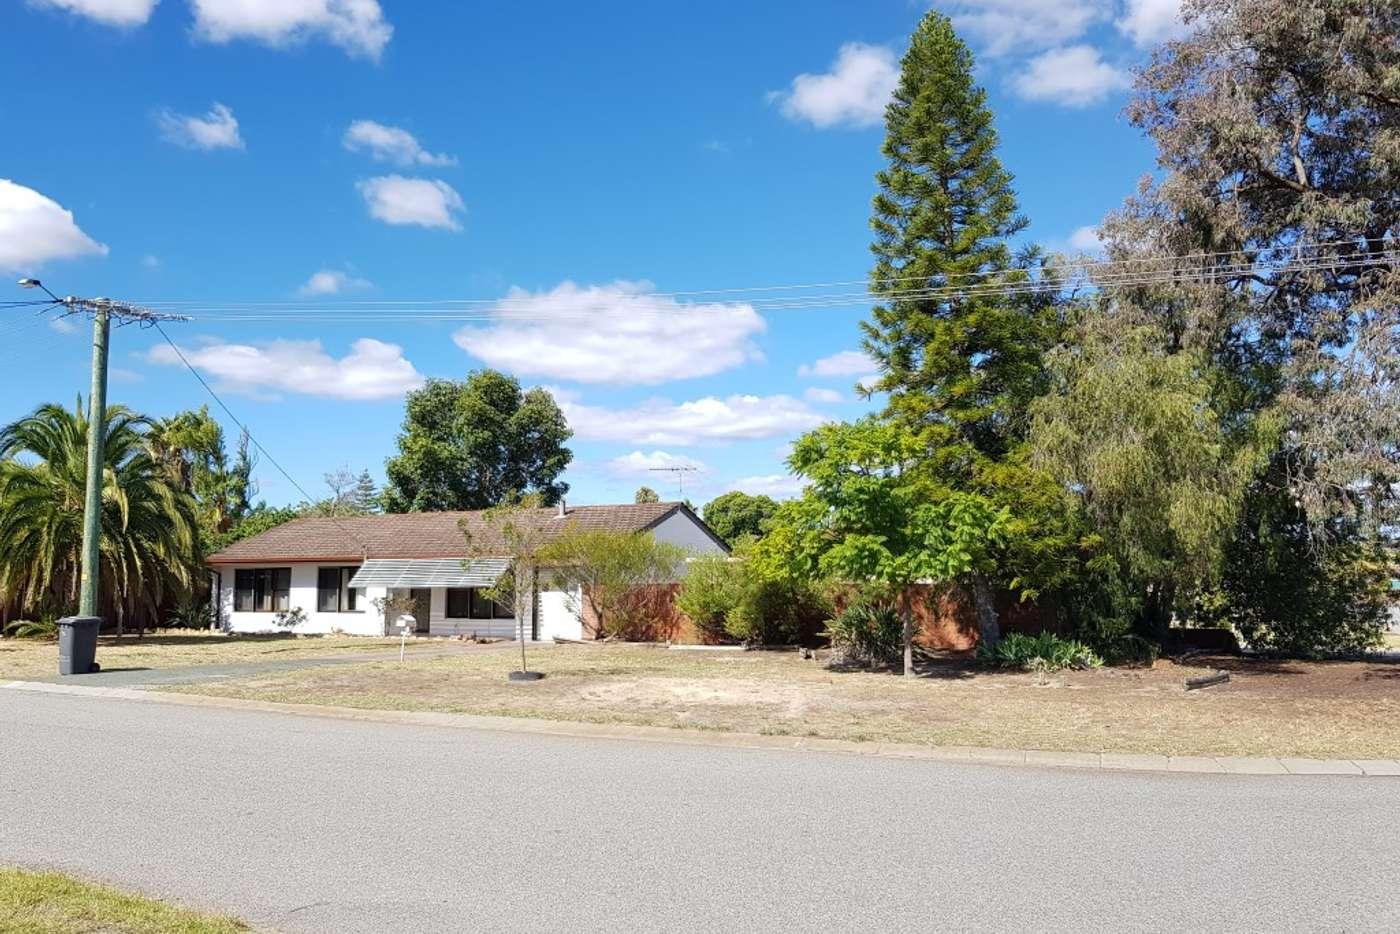 Main view of Homely house listing, 9 Waratah Drive, Camillo WA 6111